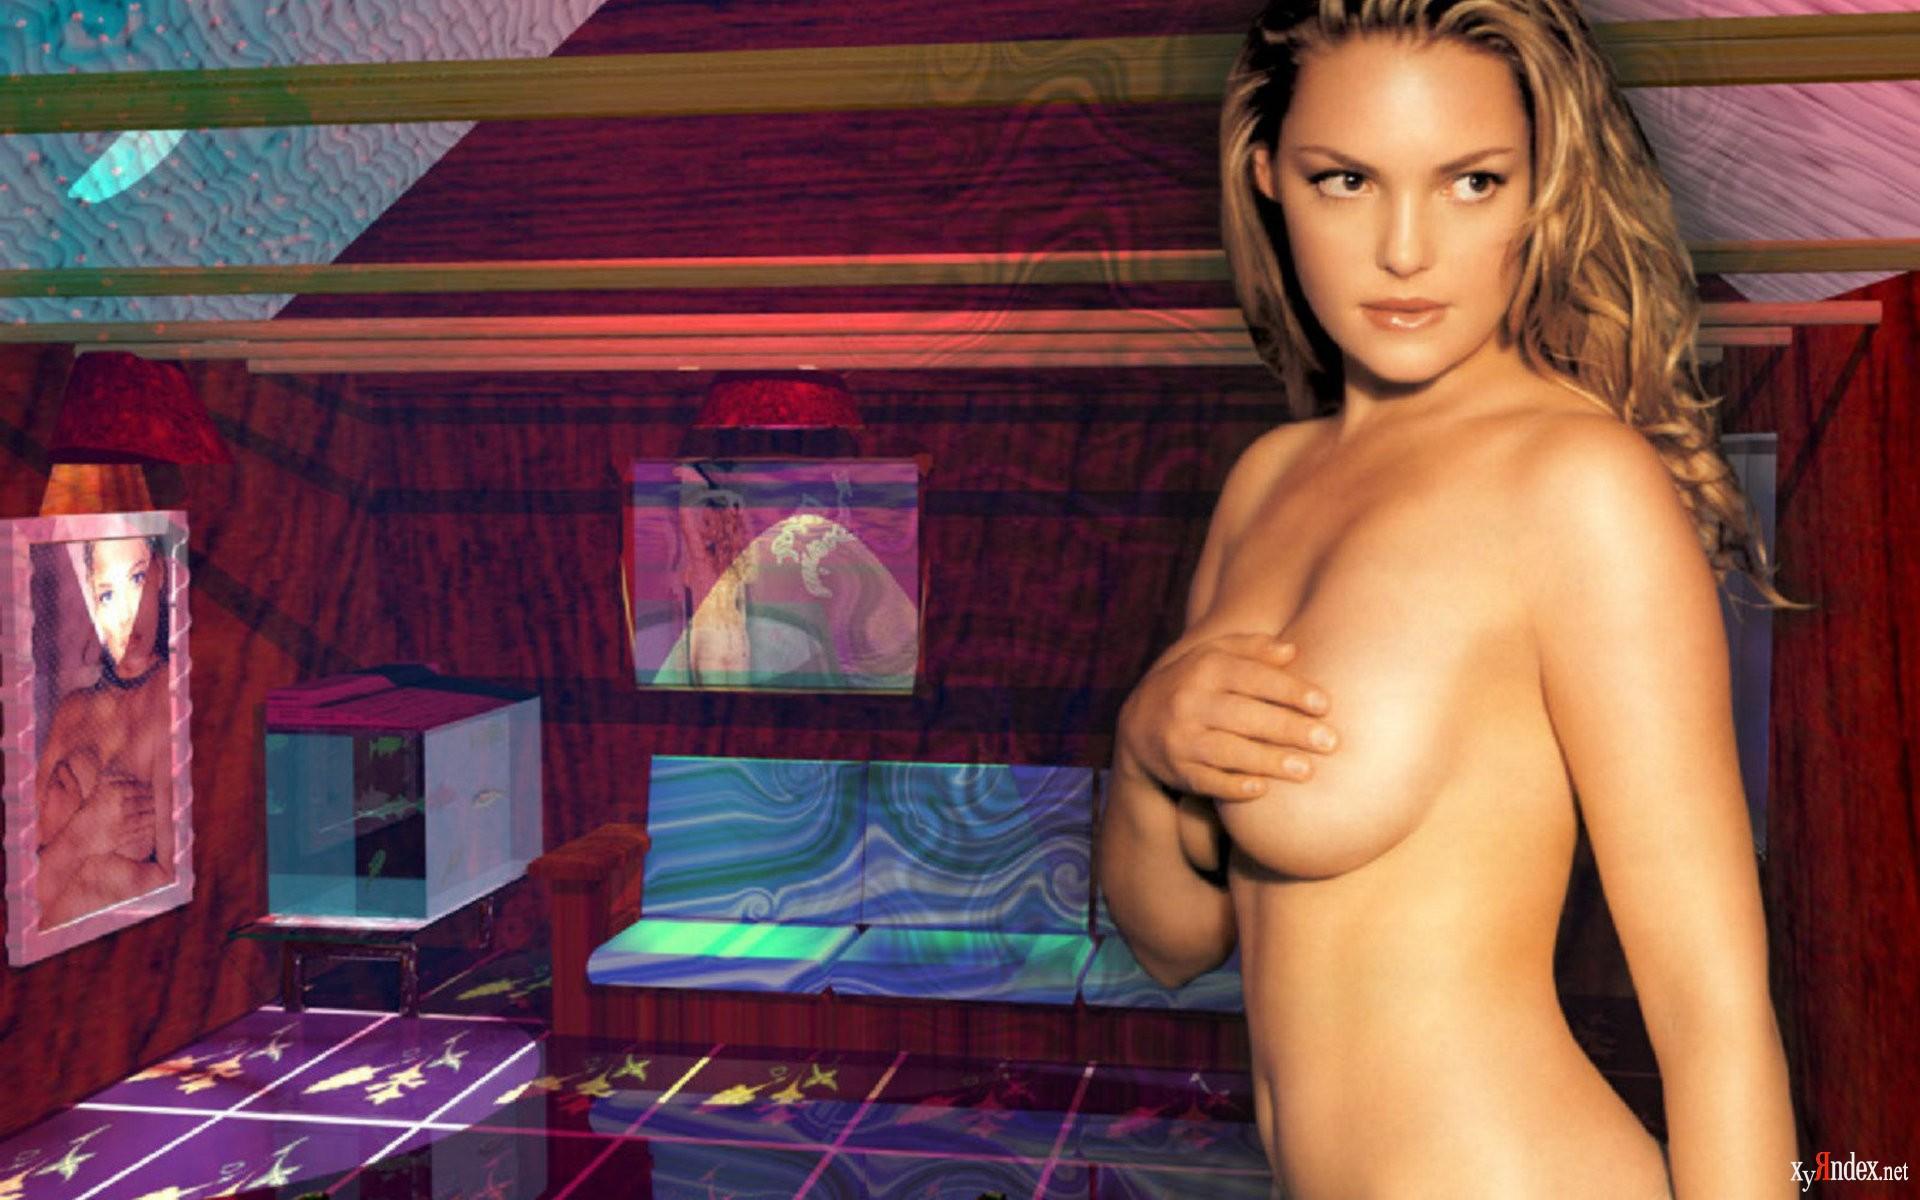 Nude photos of katherine heigl, pakistani chubby beauty